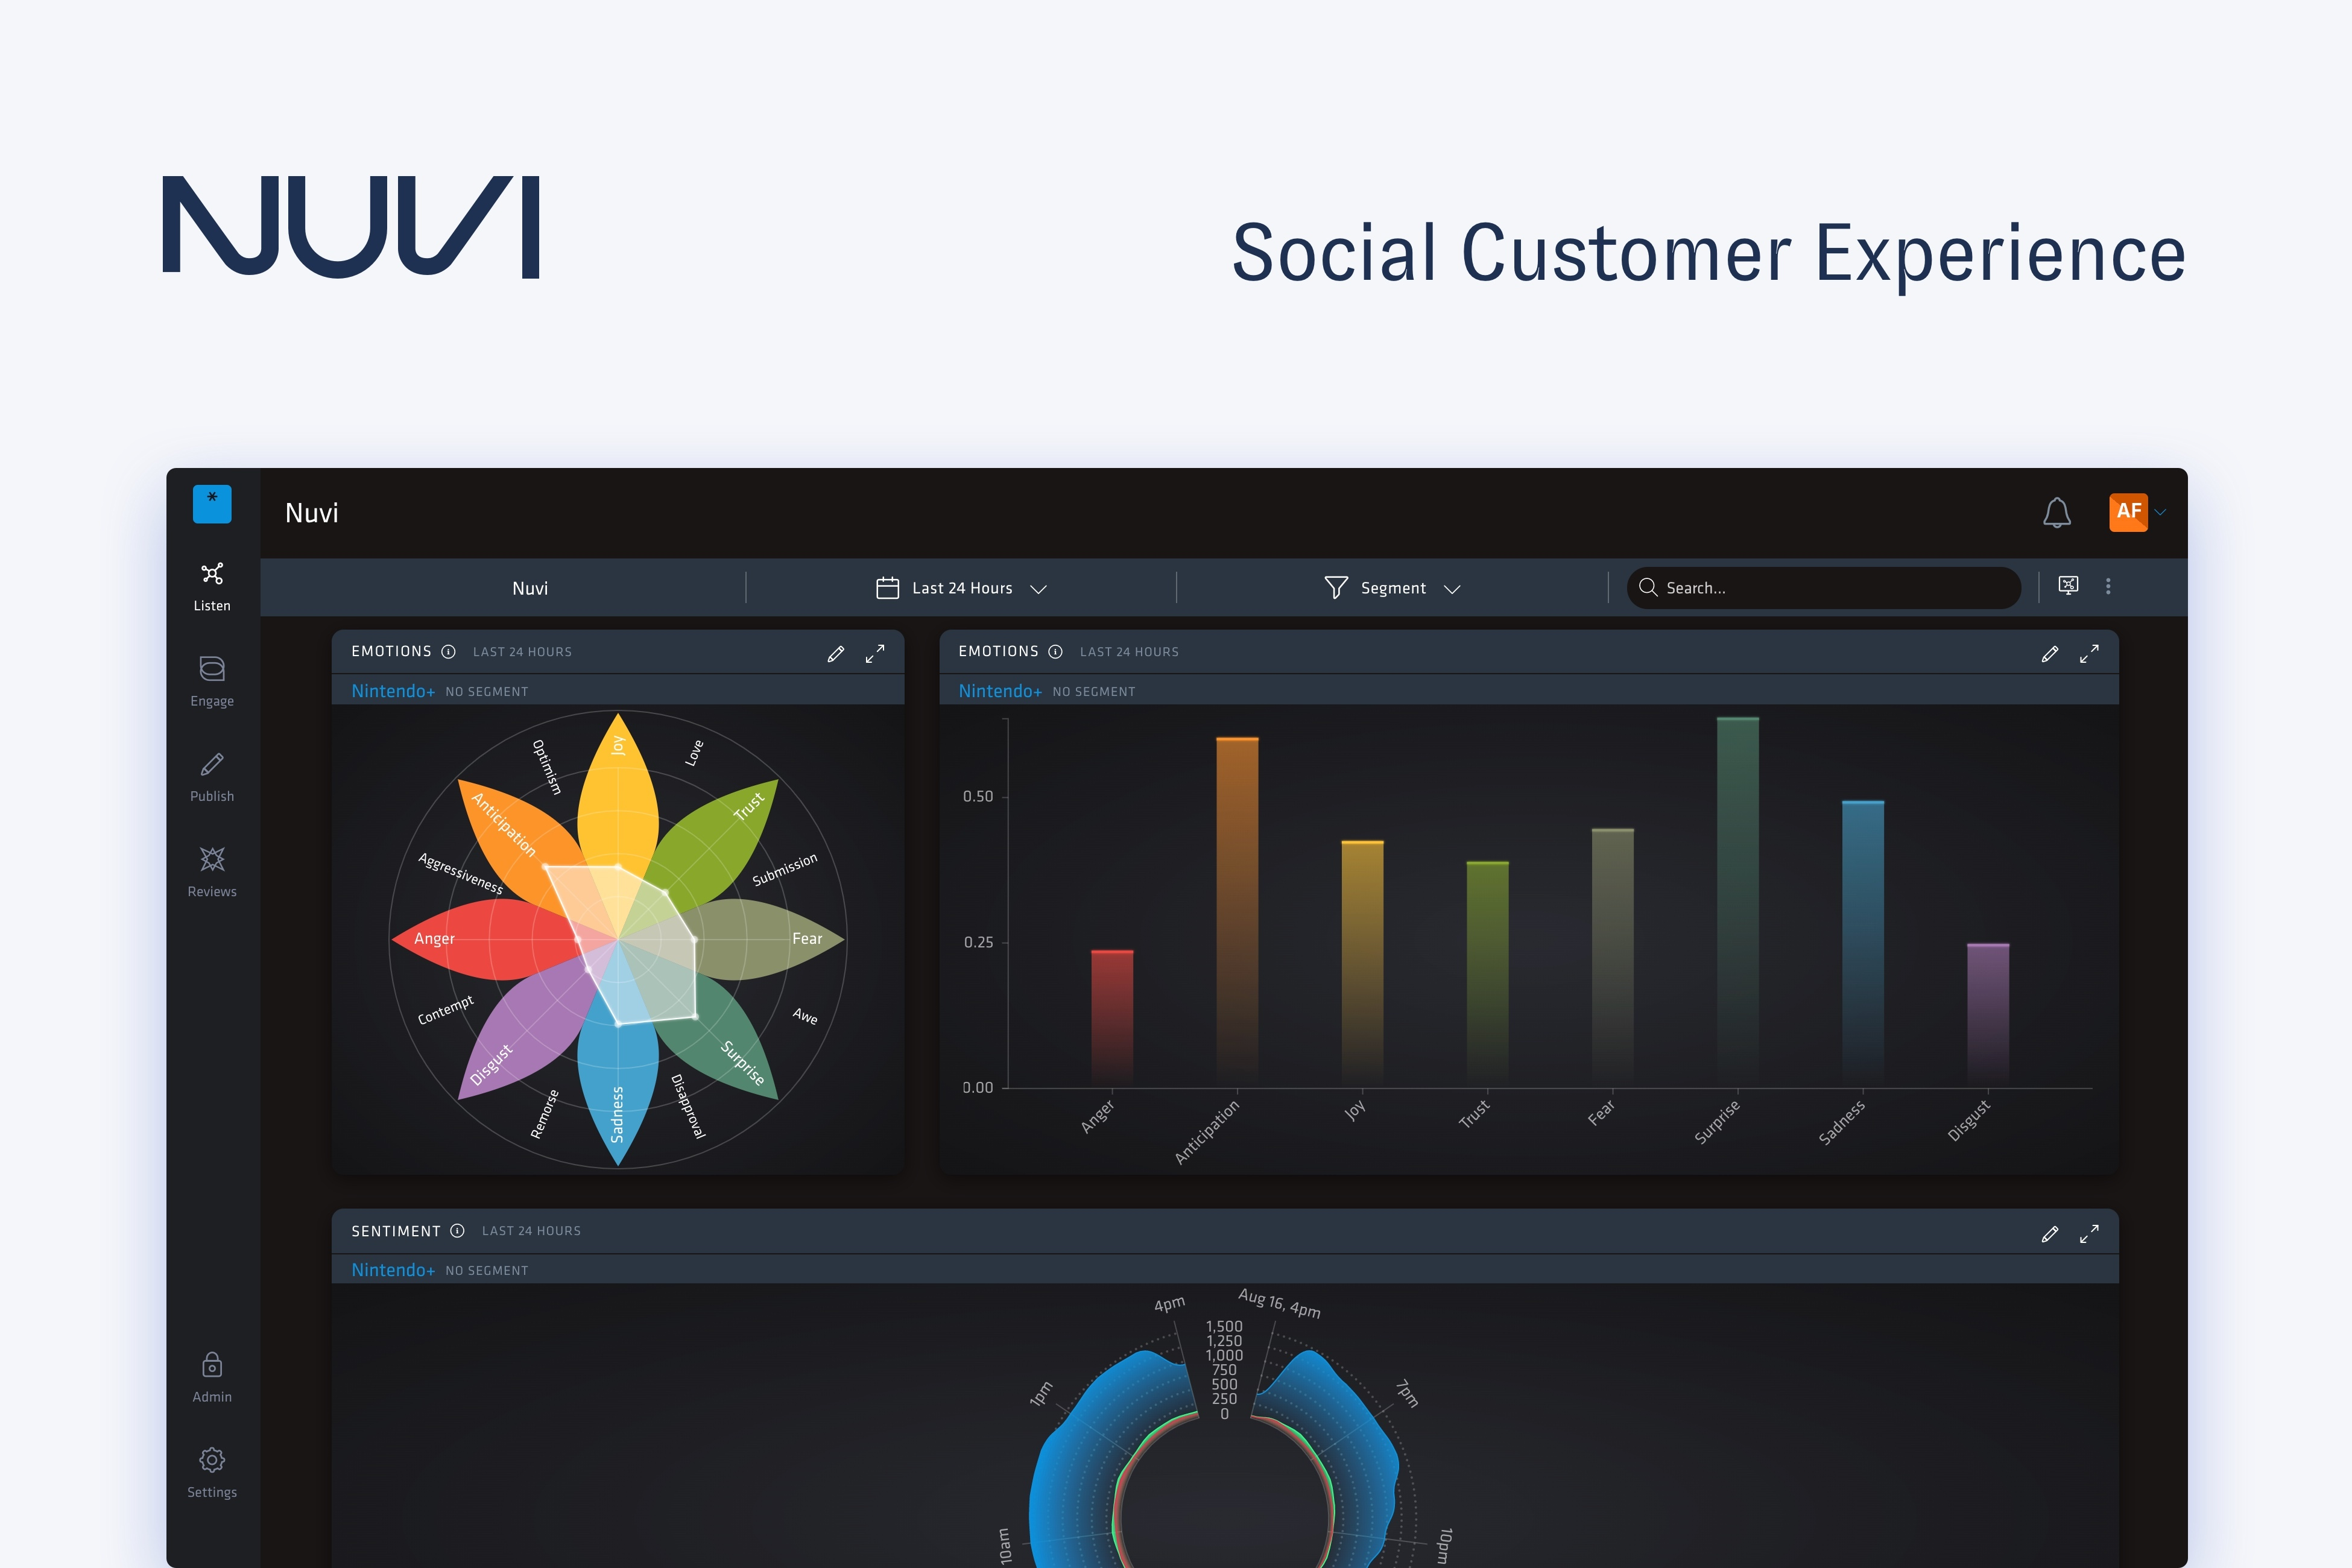 NUVI Platform Performing Social Listening Function